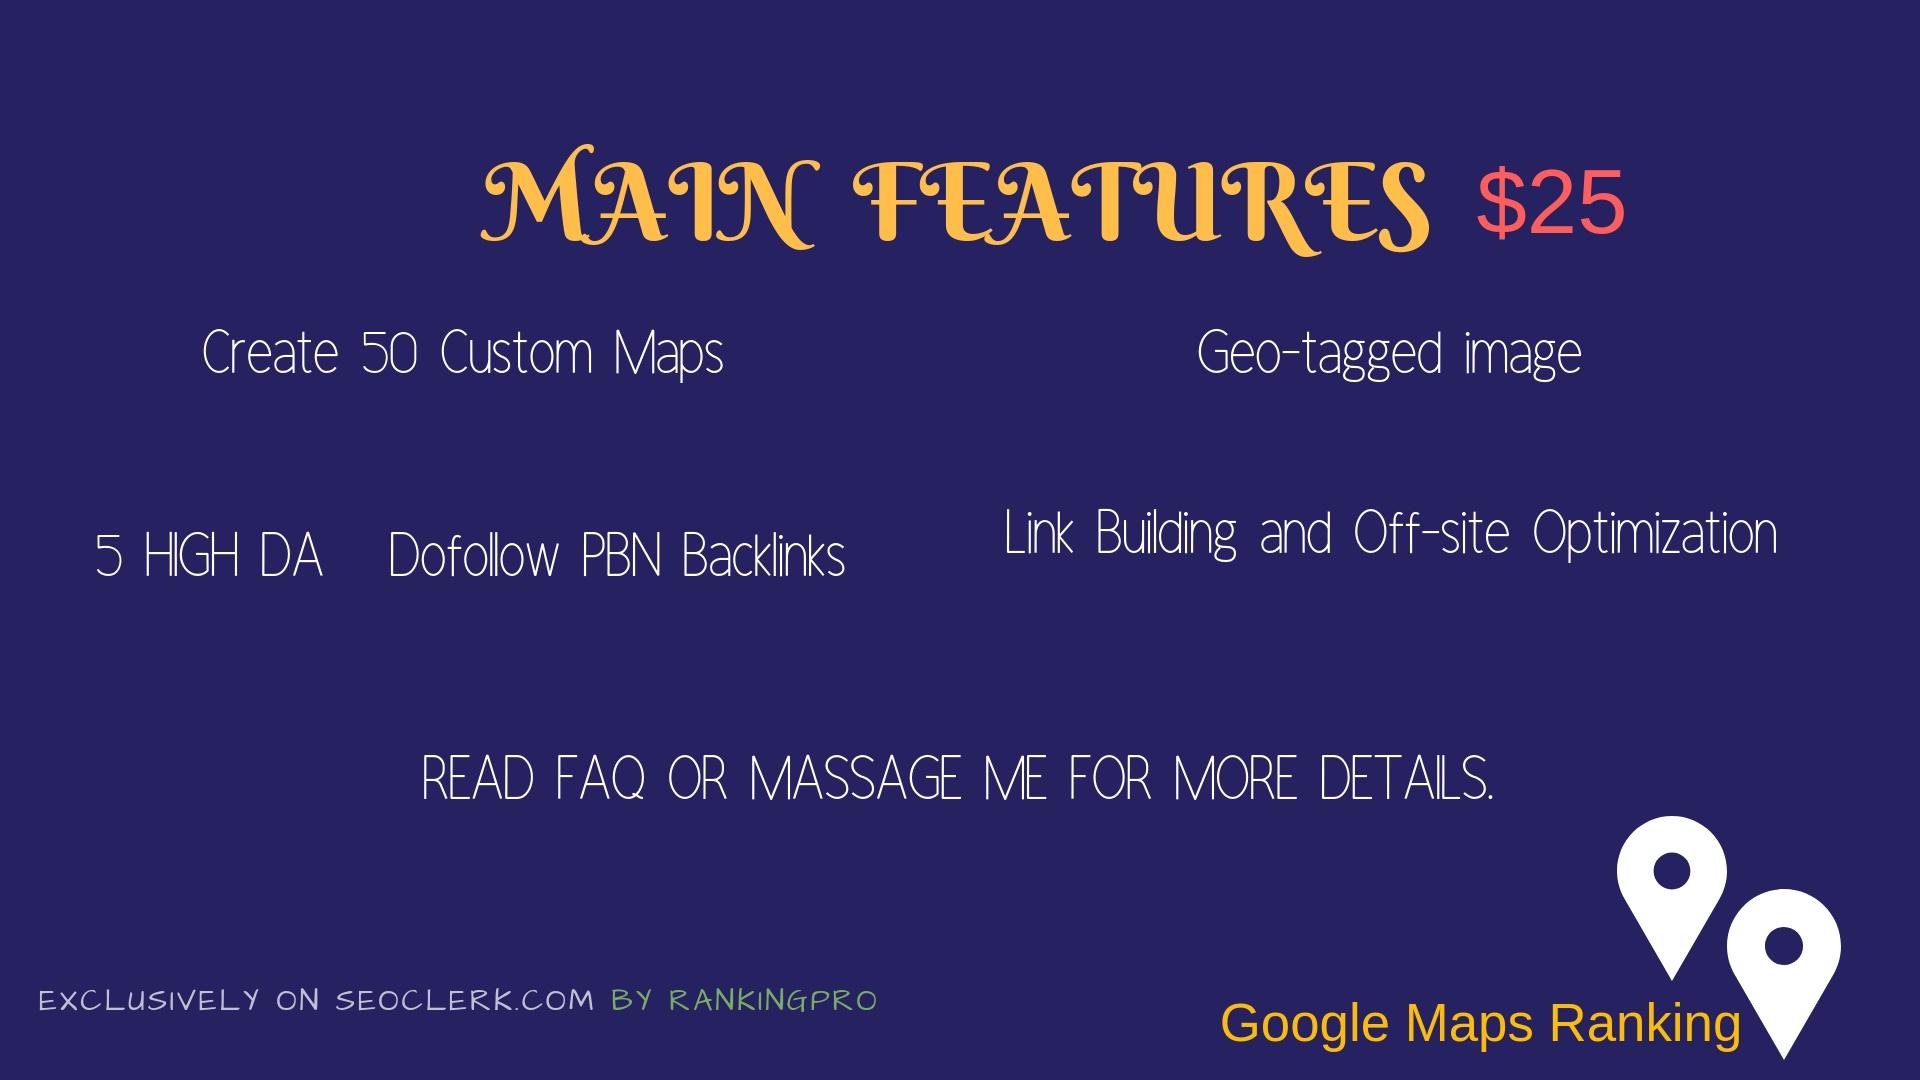 100 Google Custom Maps, Google Local Ranking